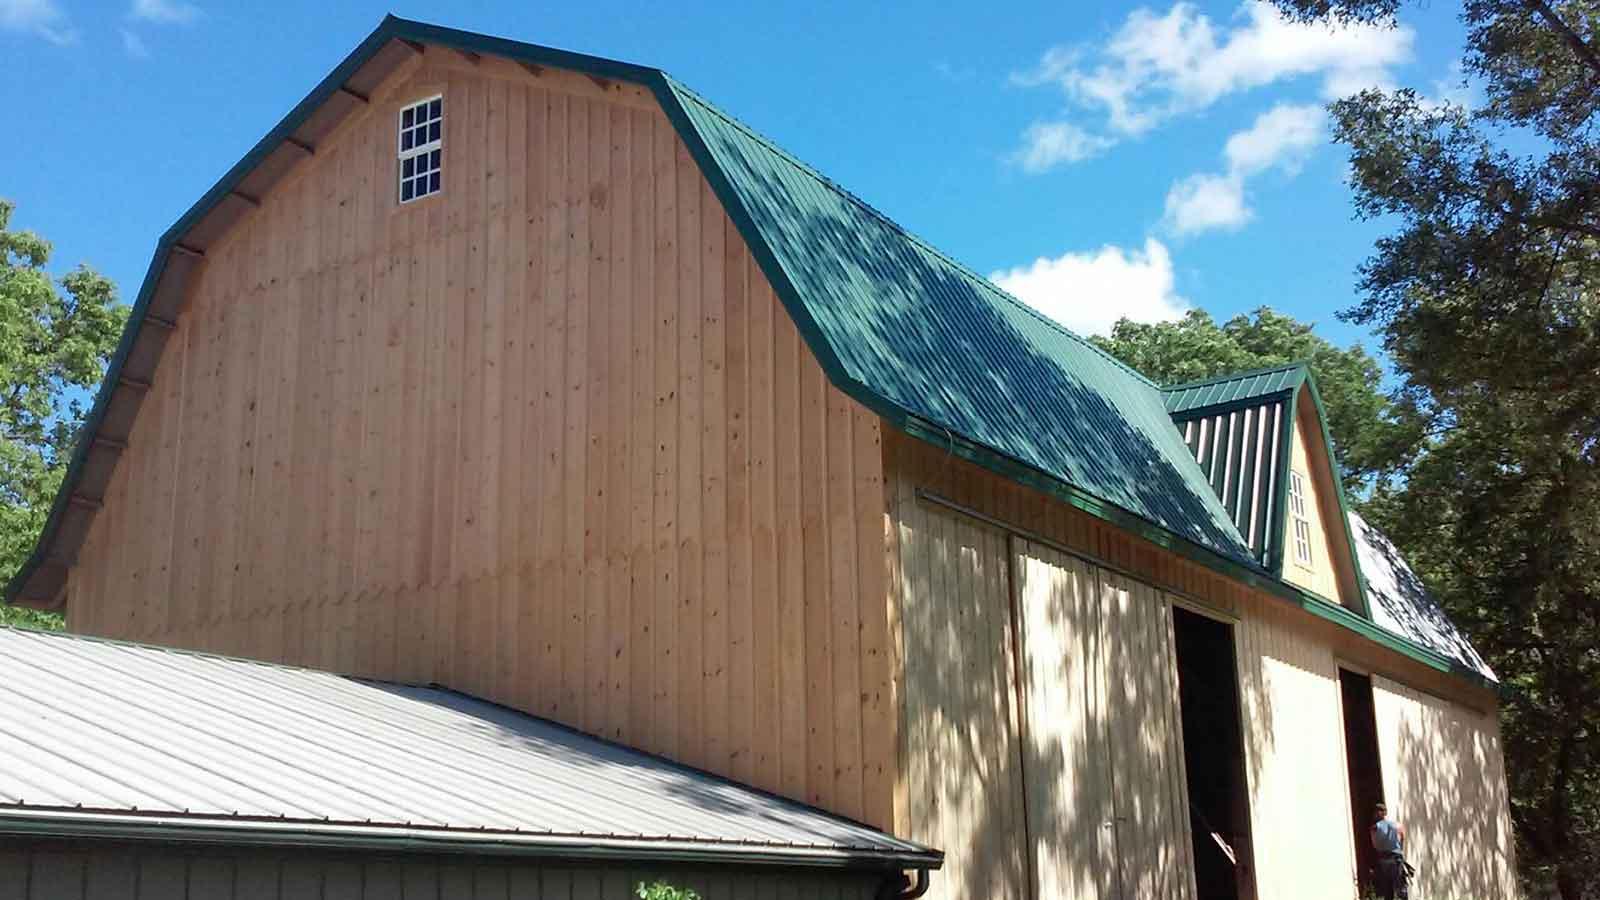 Bender builders your barn repair and restoration experts for Barn renovation